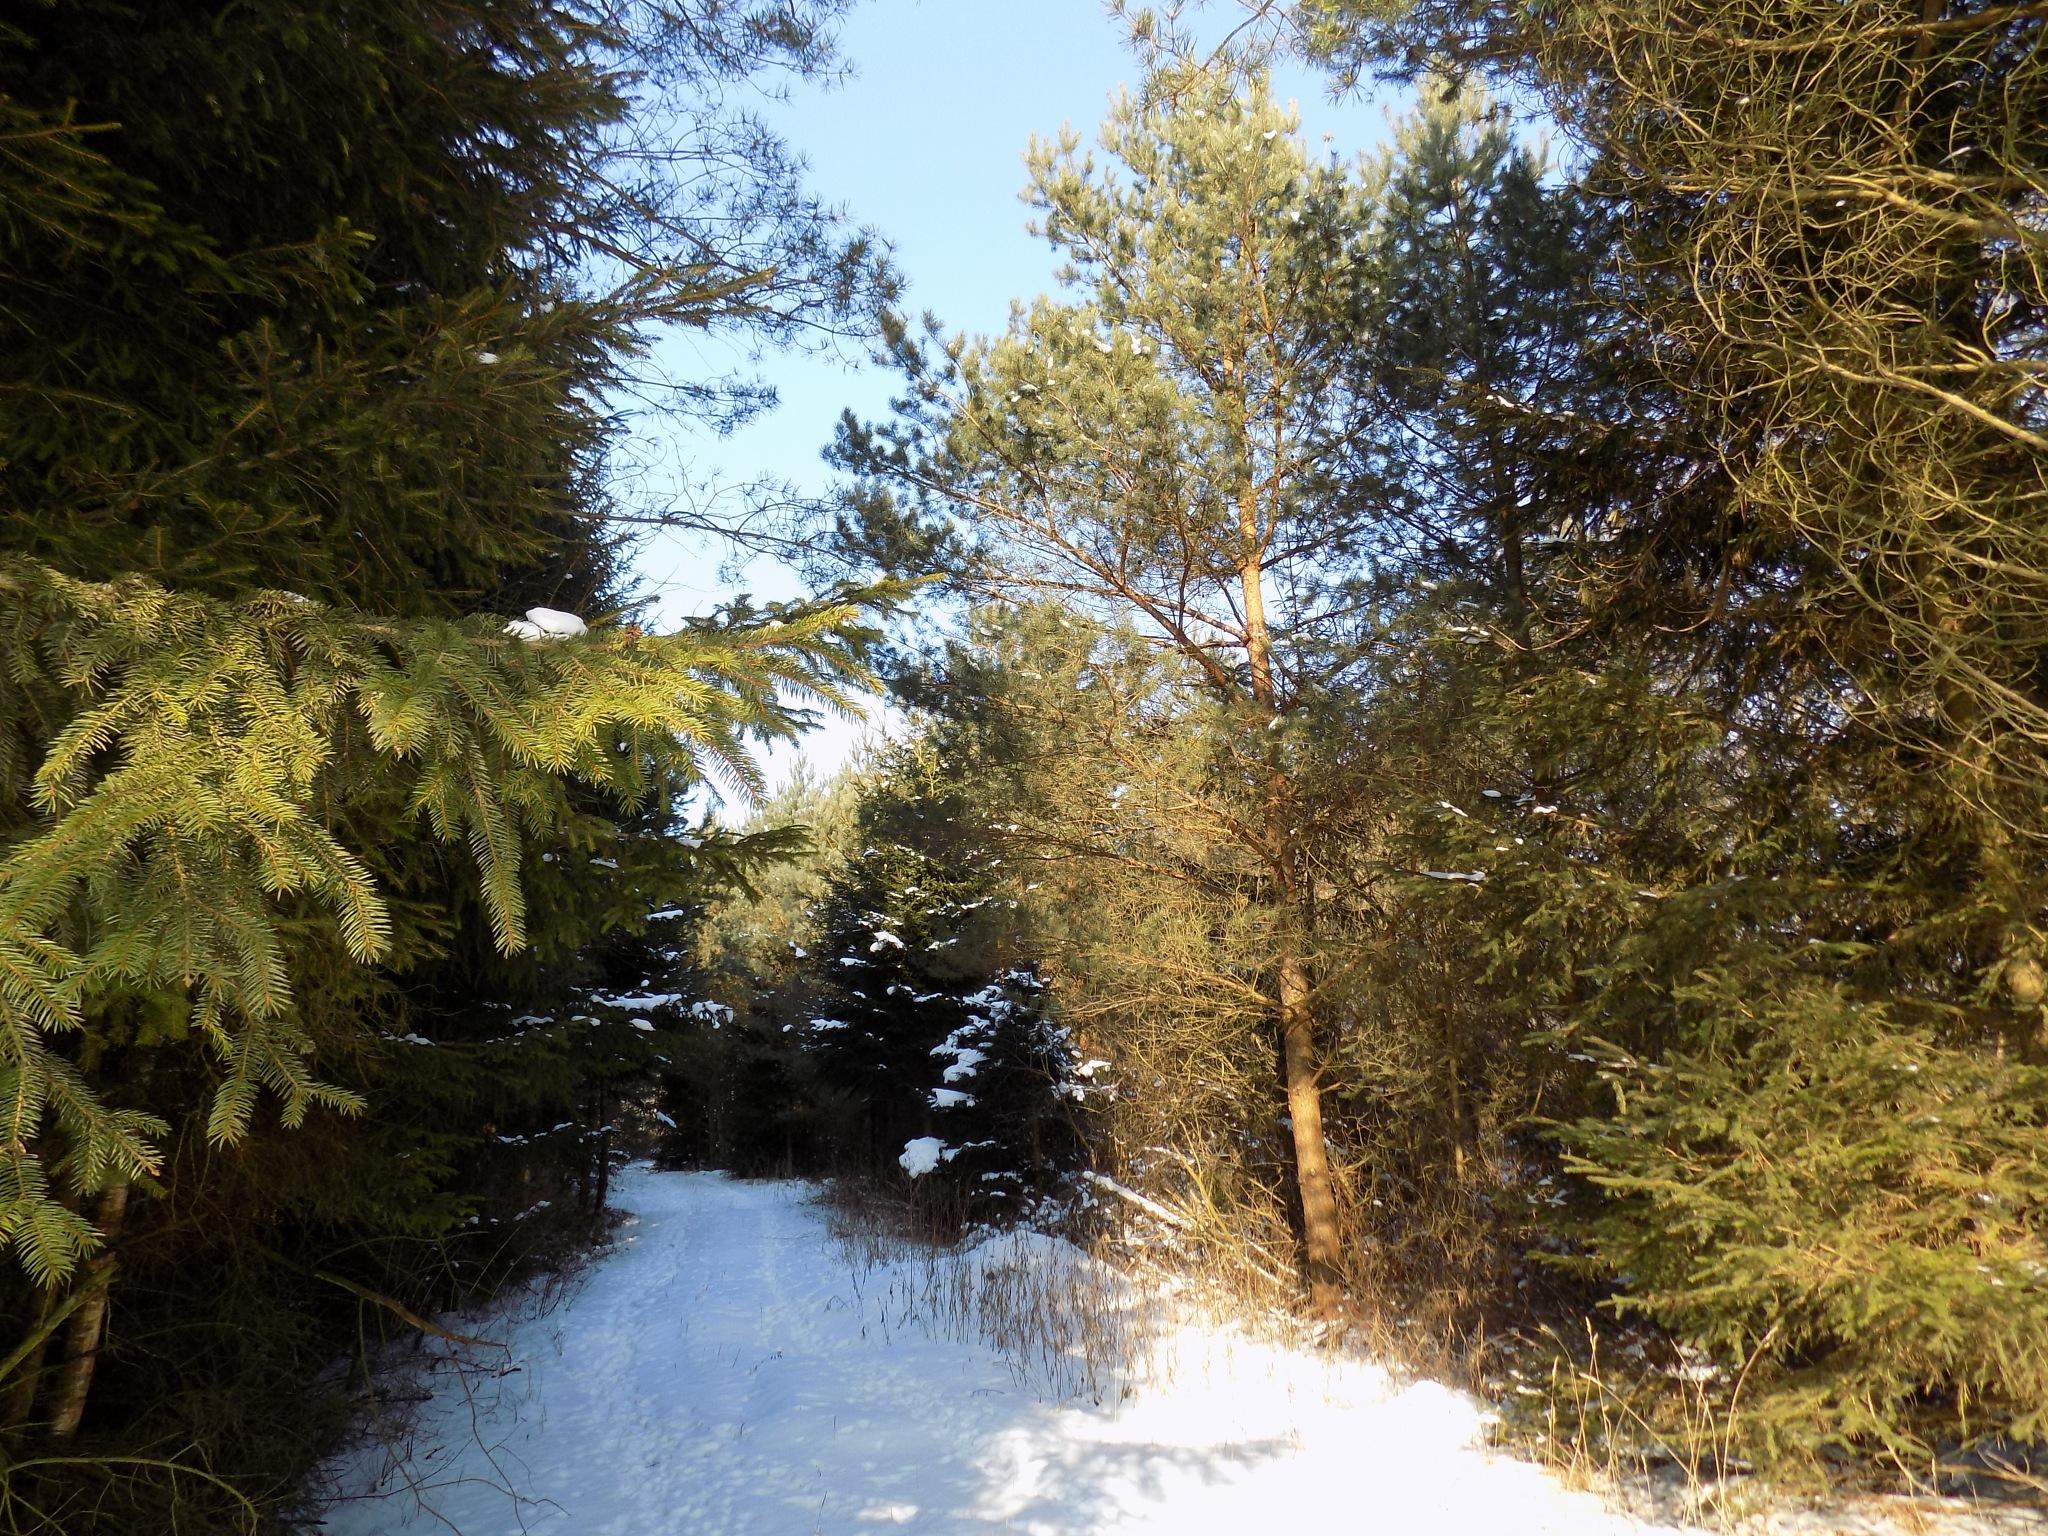 Path in the forest by uzkuraitiene62